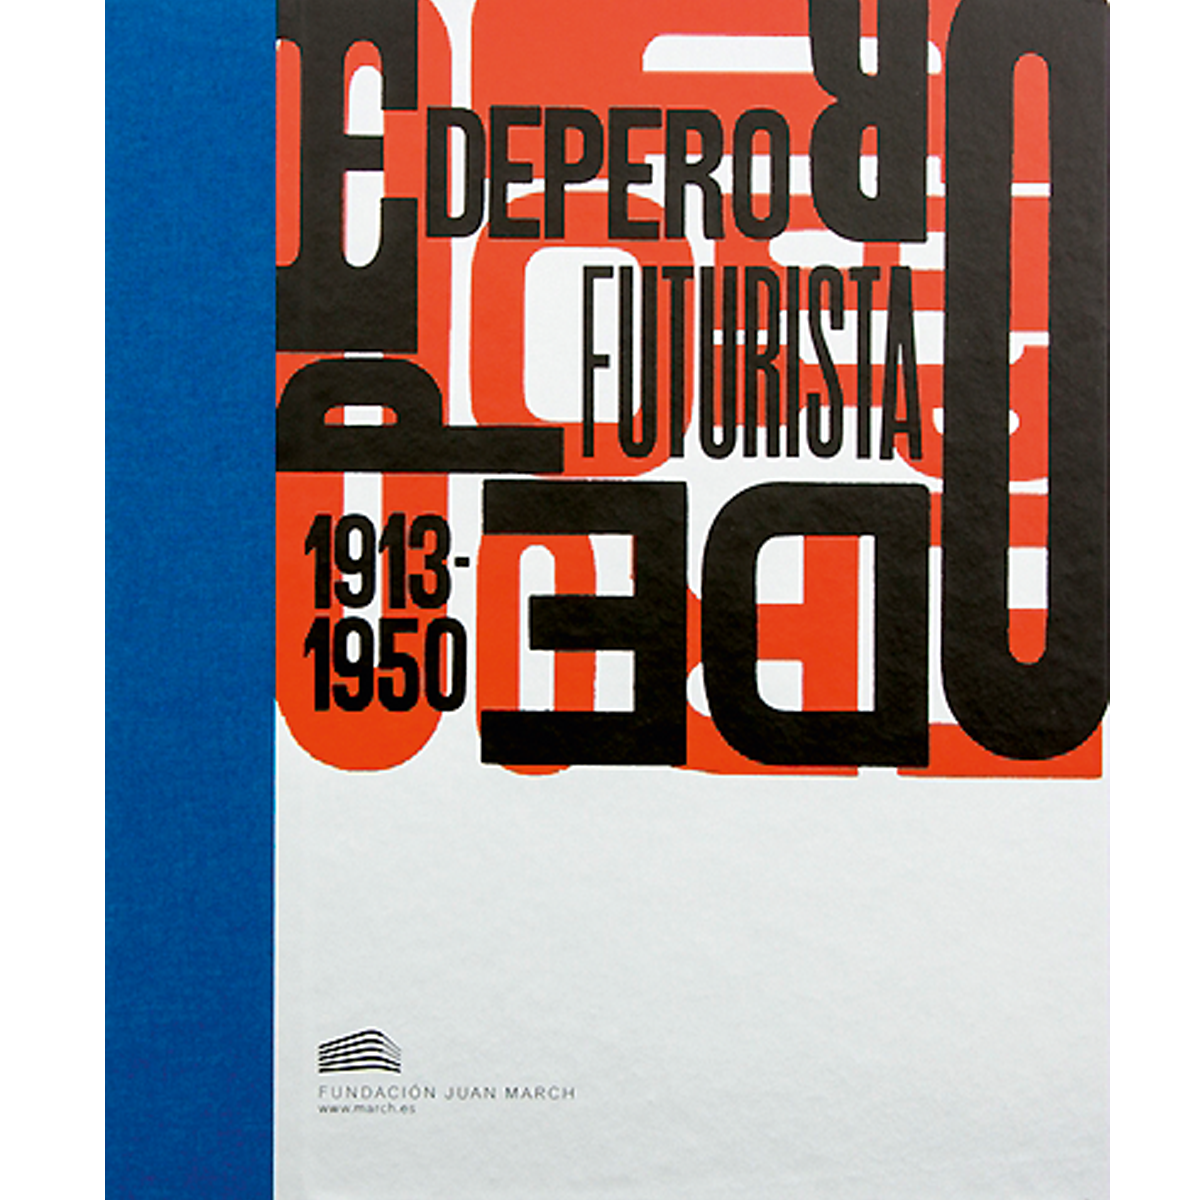 Depero Futurista, 1913-1950